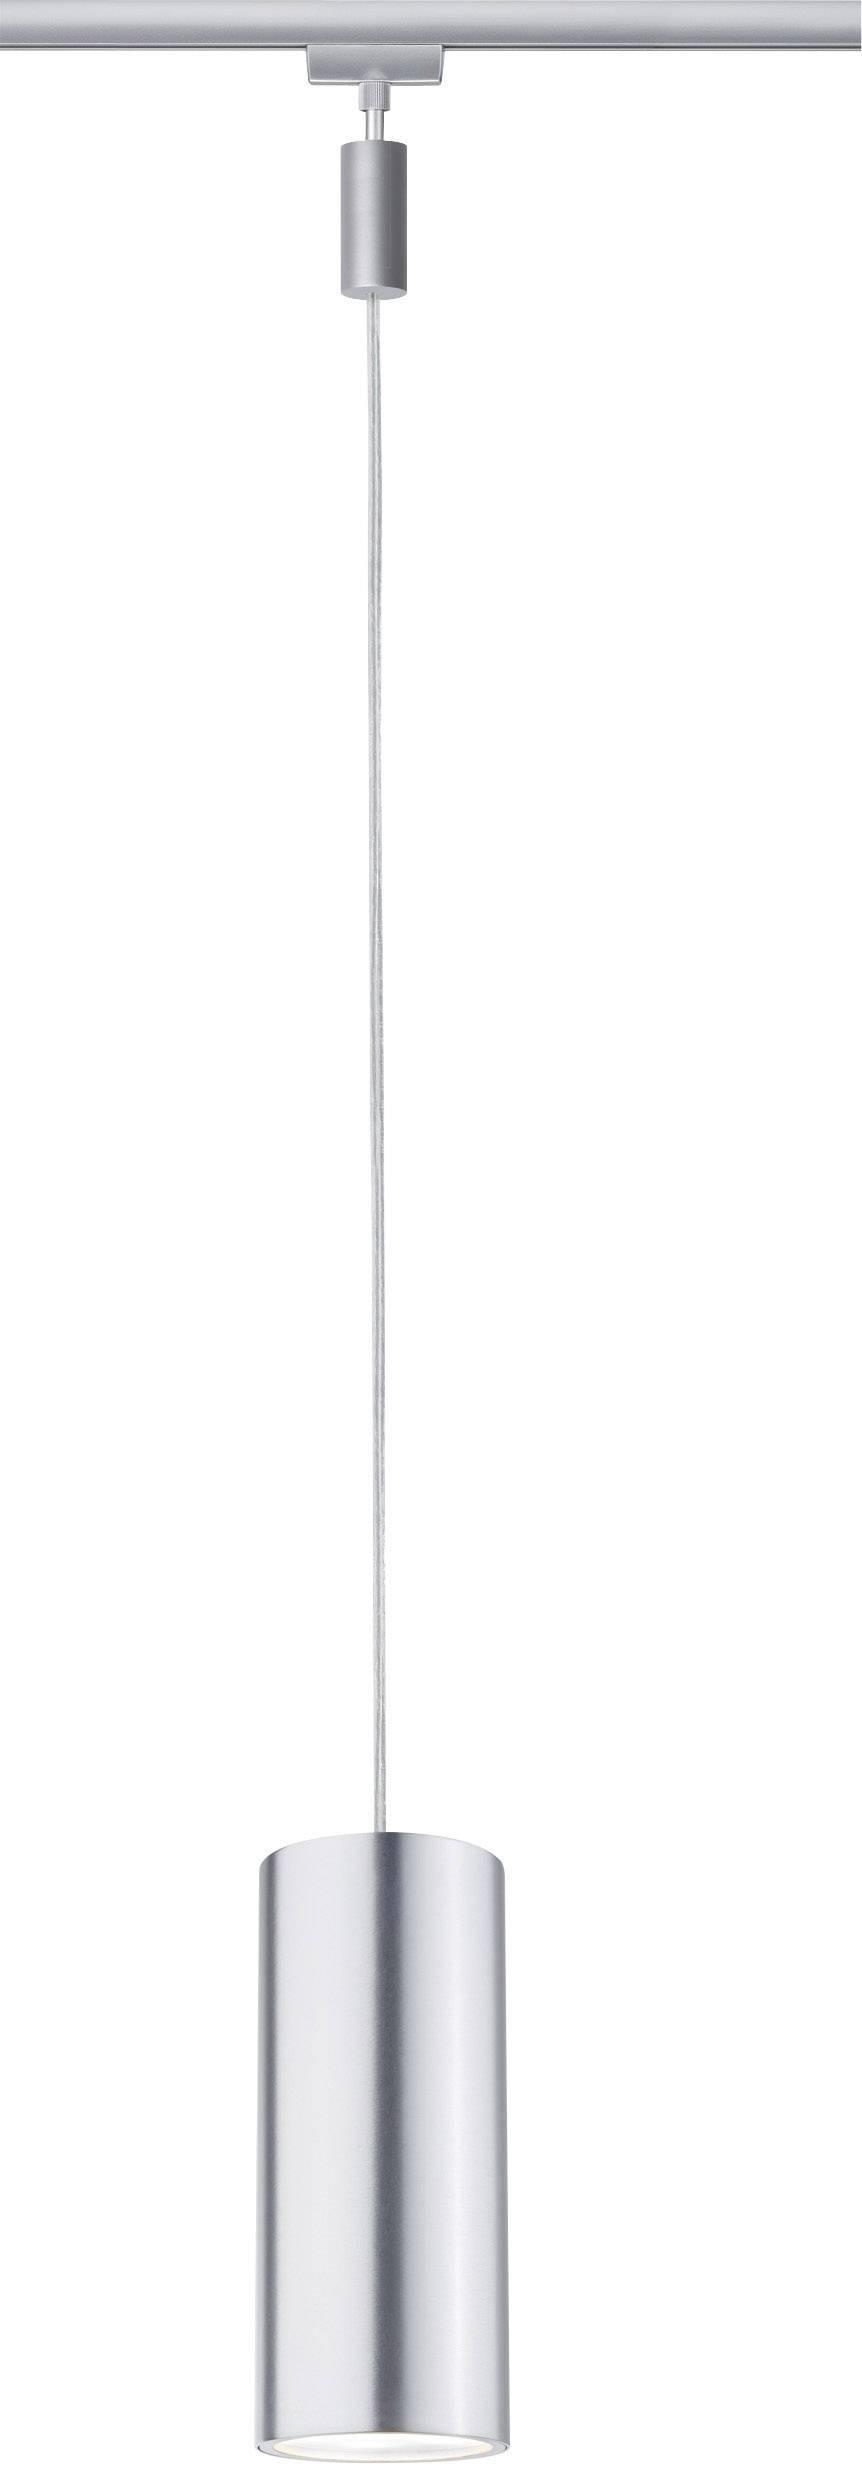 Paulmann barrel lampada per sistema su binario urail for Binario paulmann